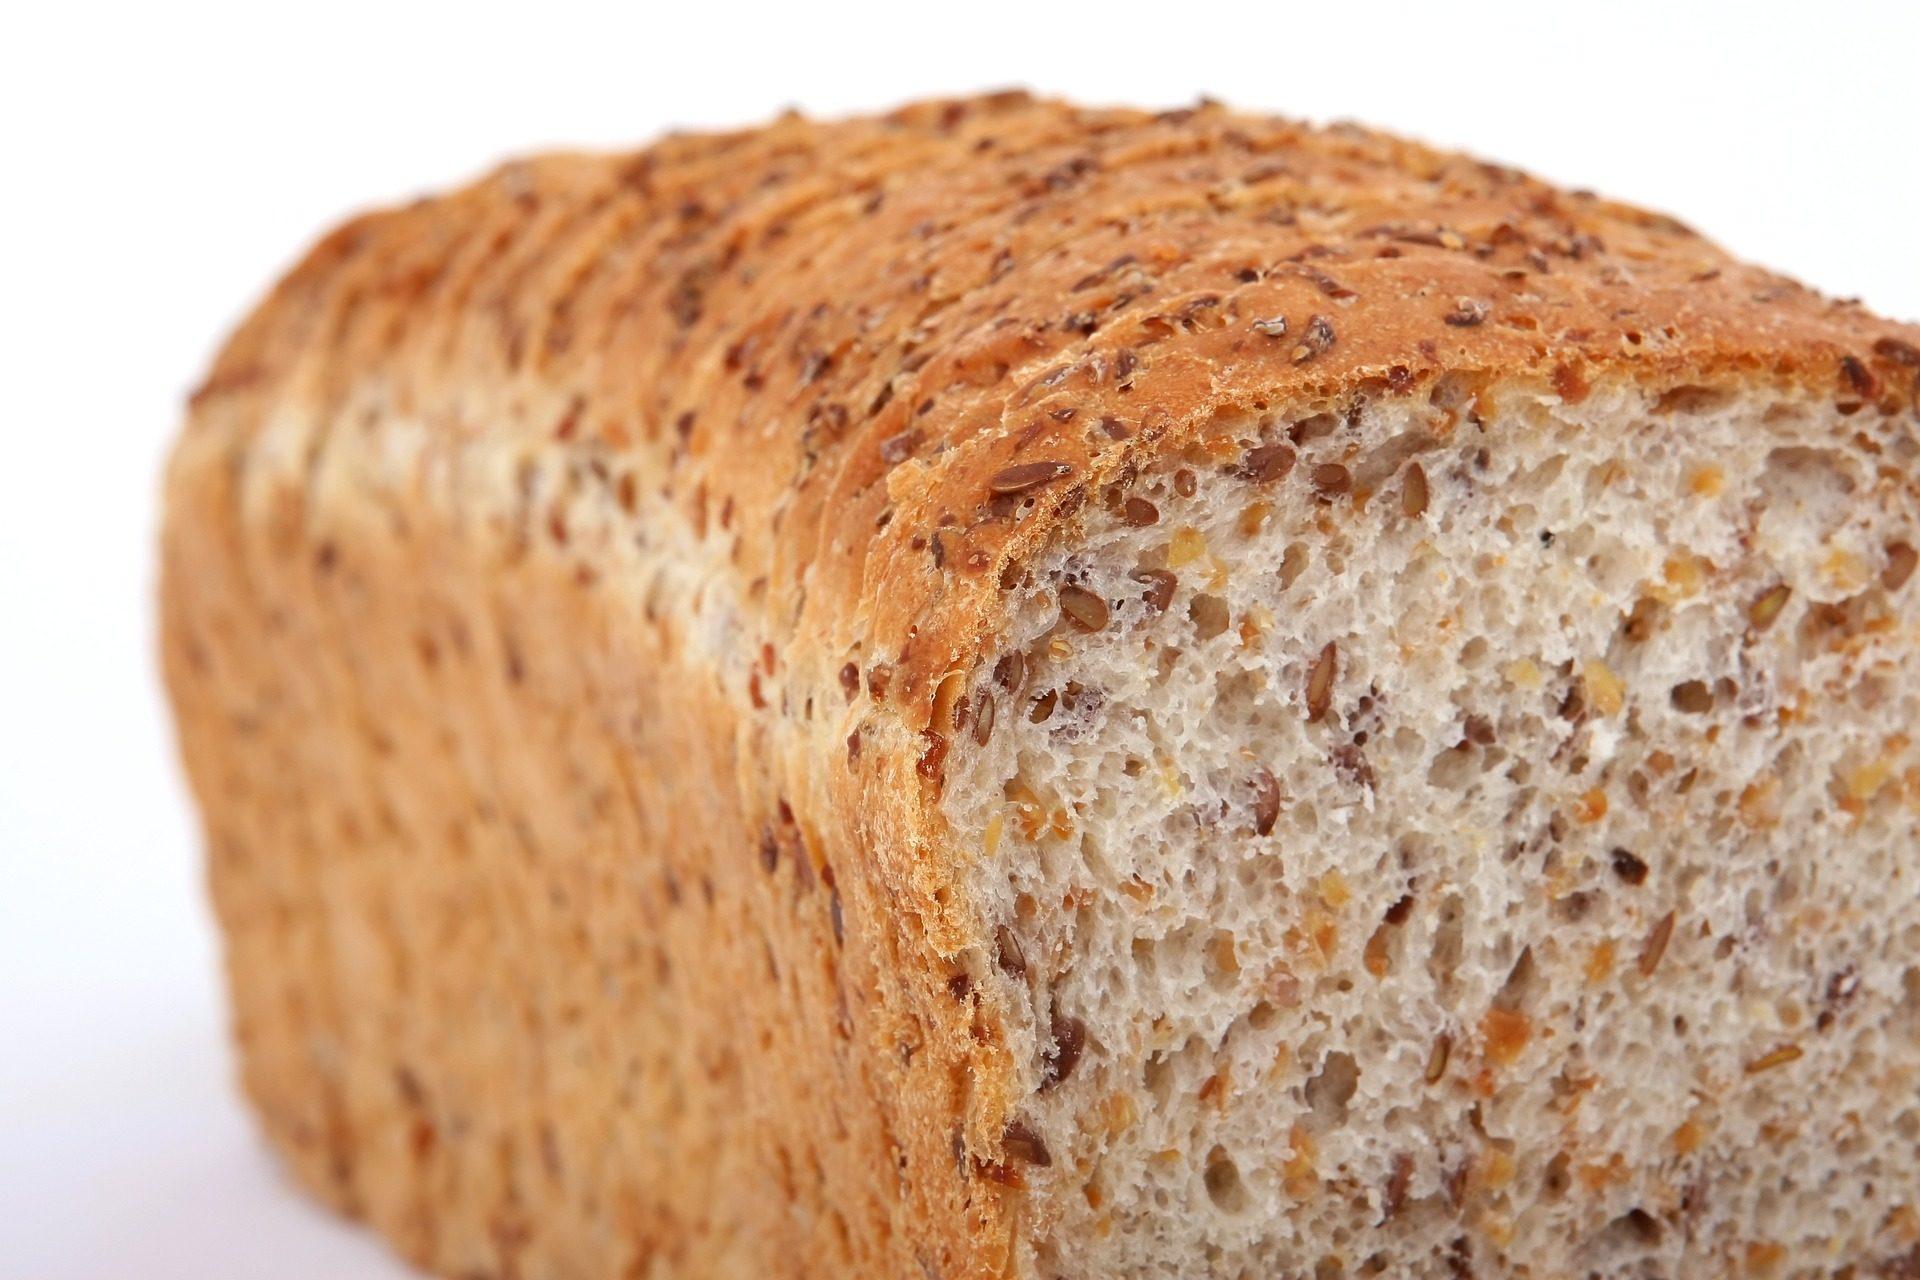 रोटी, अनाज, नाश्ता, आहार, फाइबर, aperitivo - HD वॉलपेपर - प्रोफेसर-falken.com